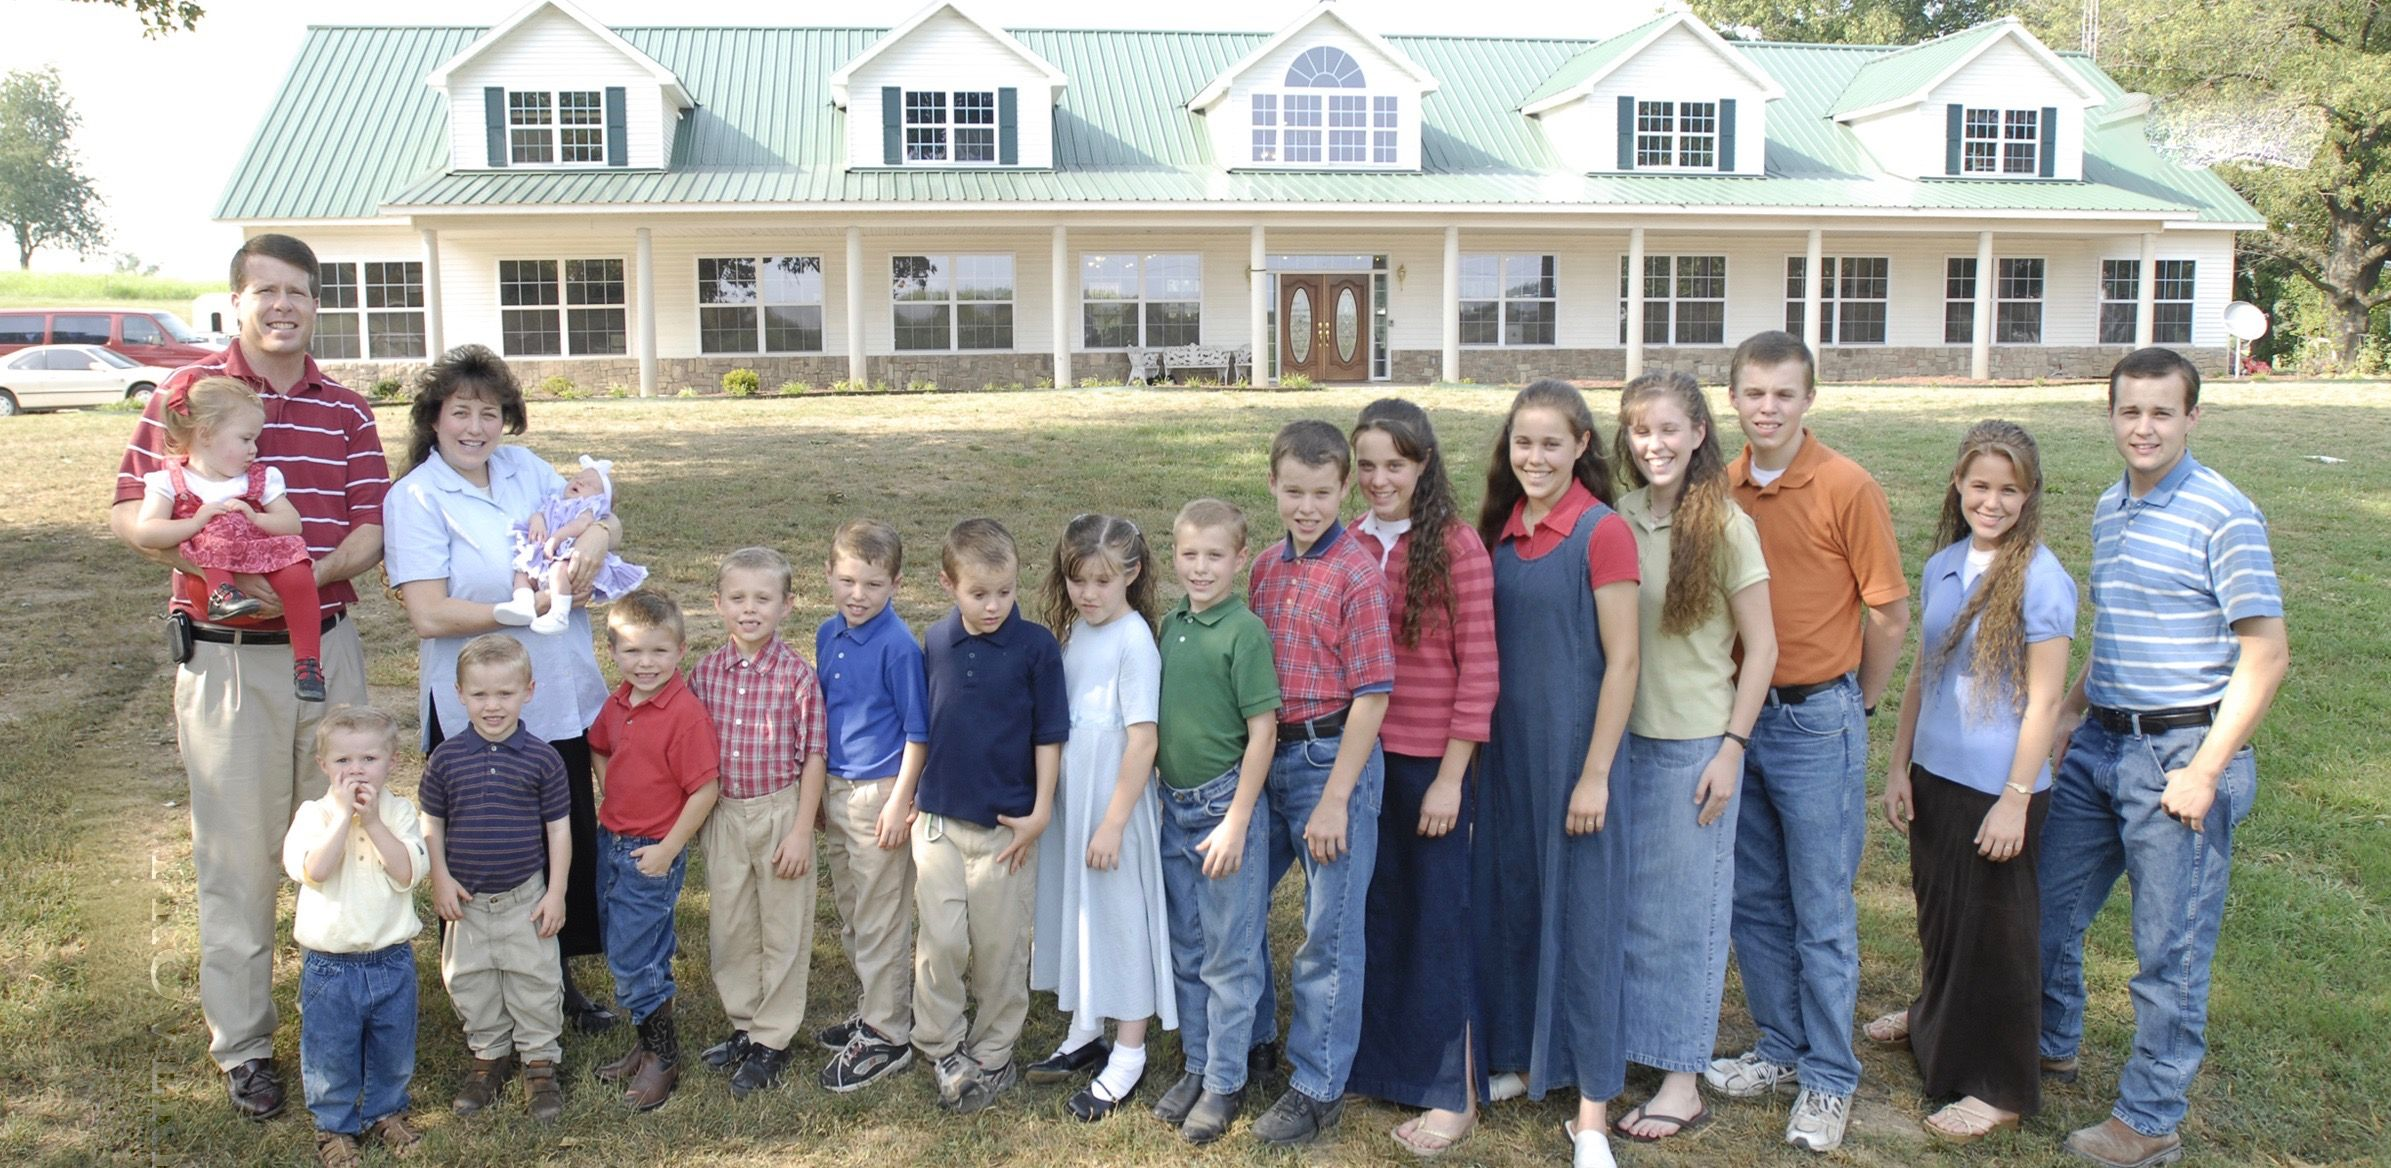 The Duggar family standing outside home